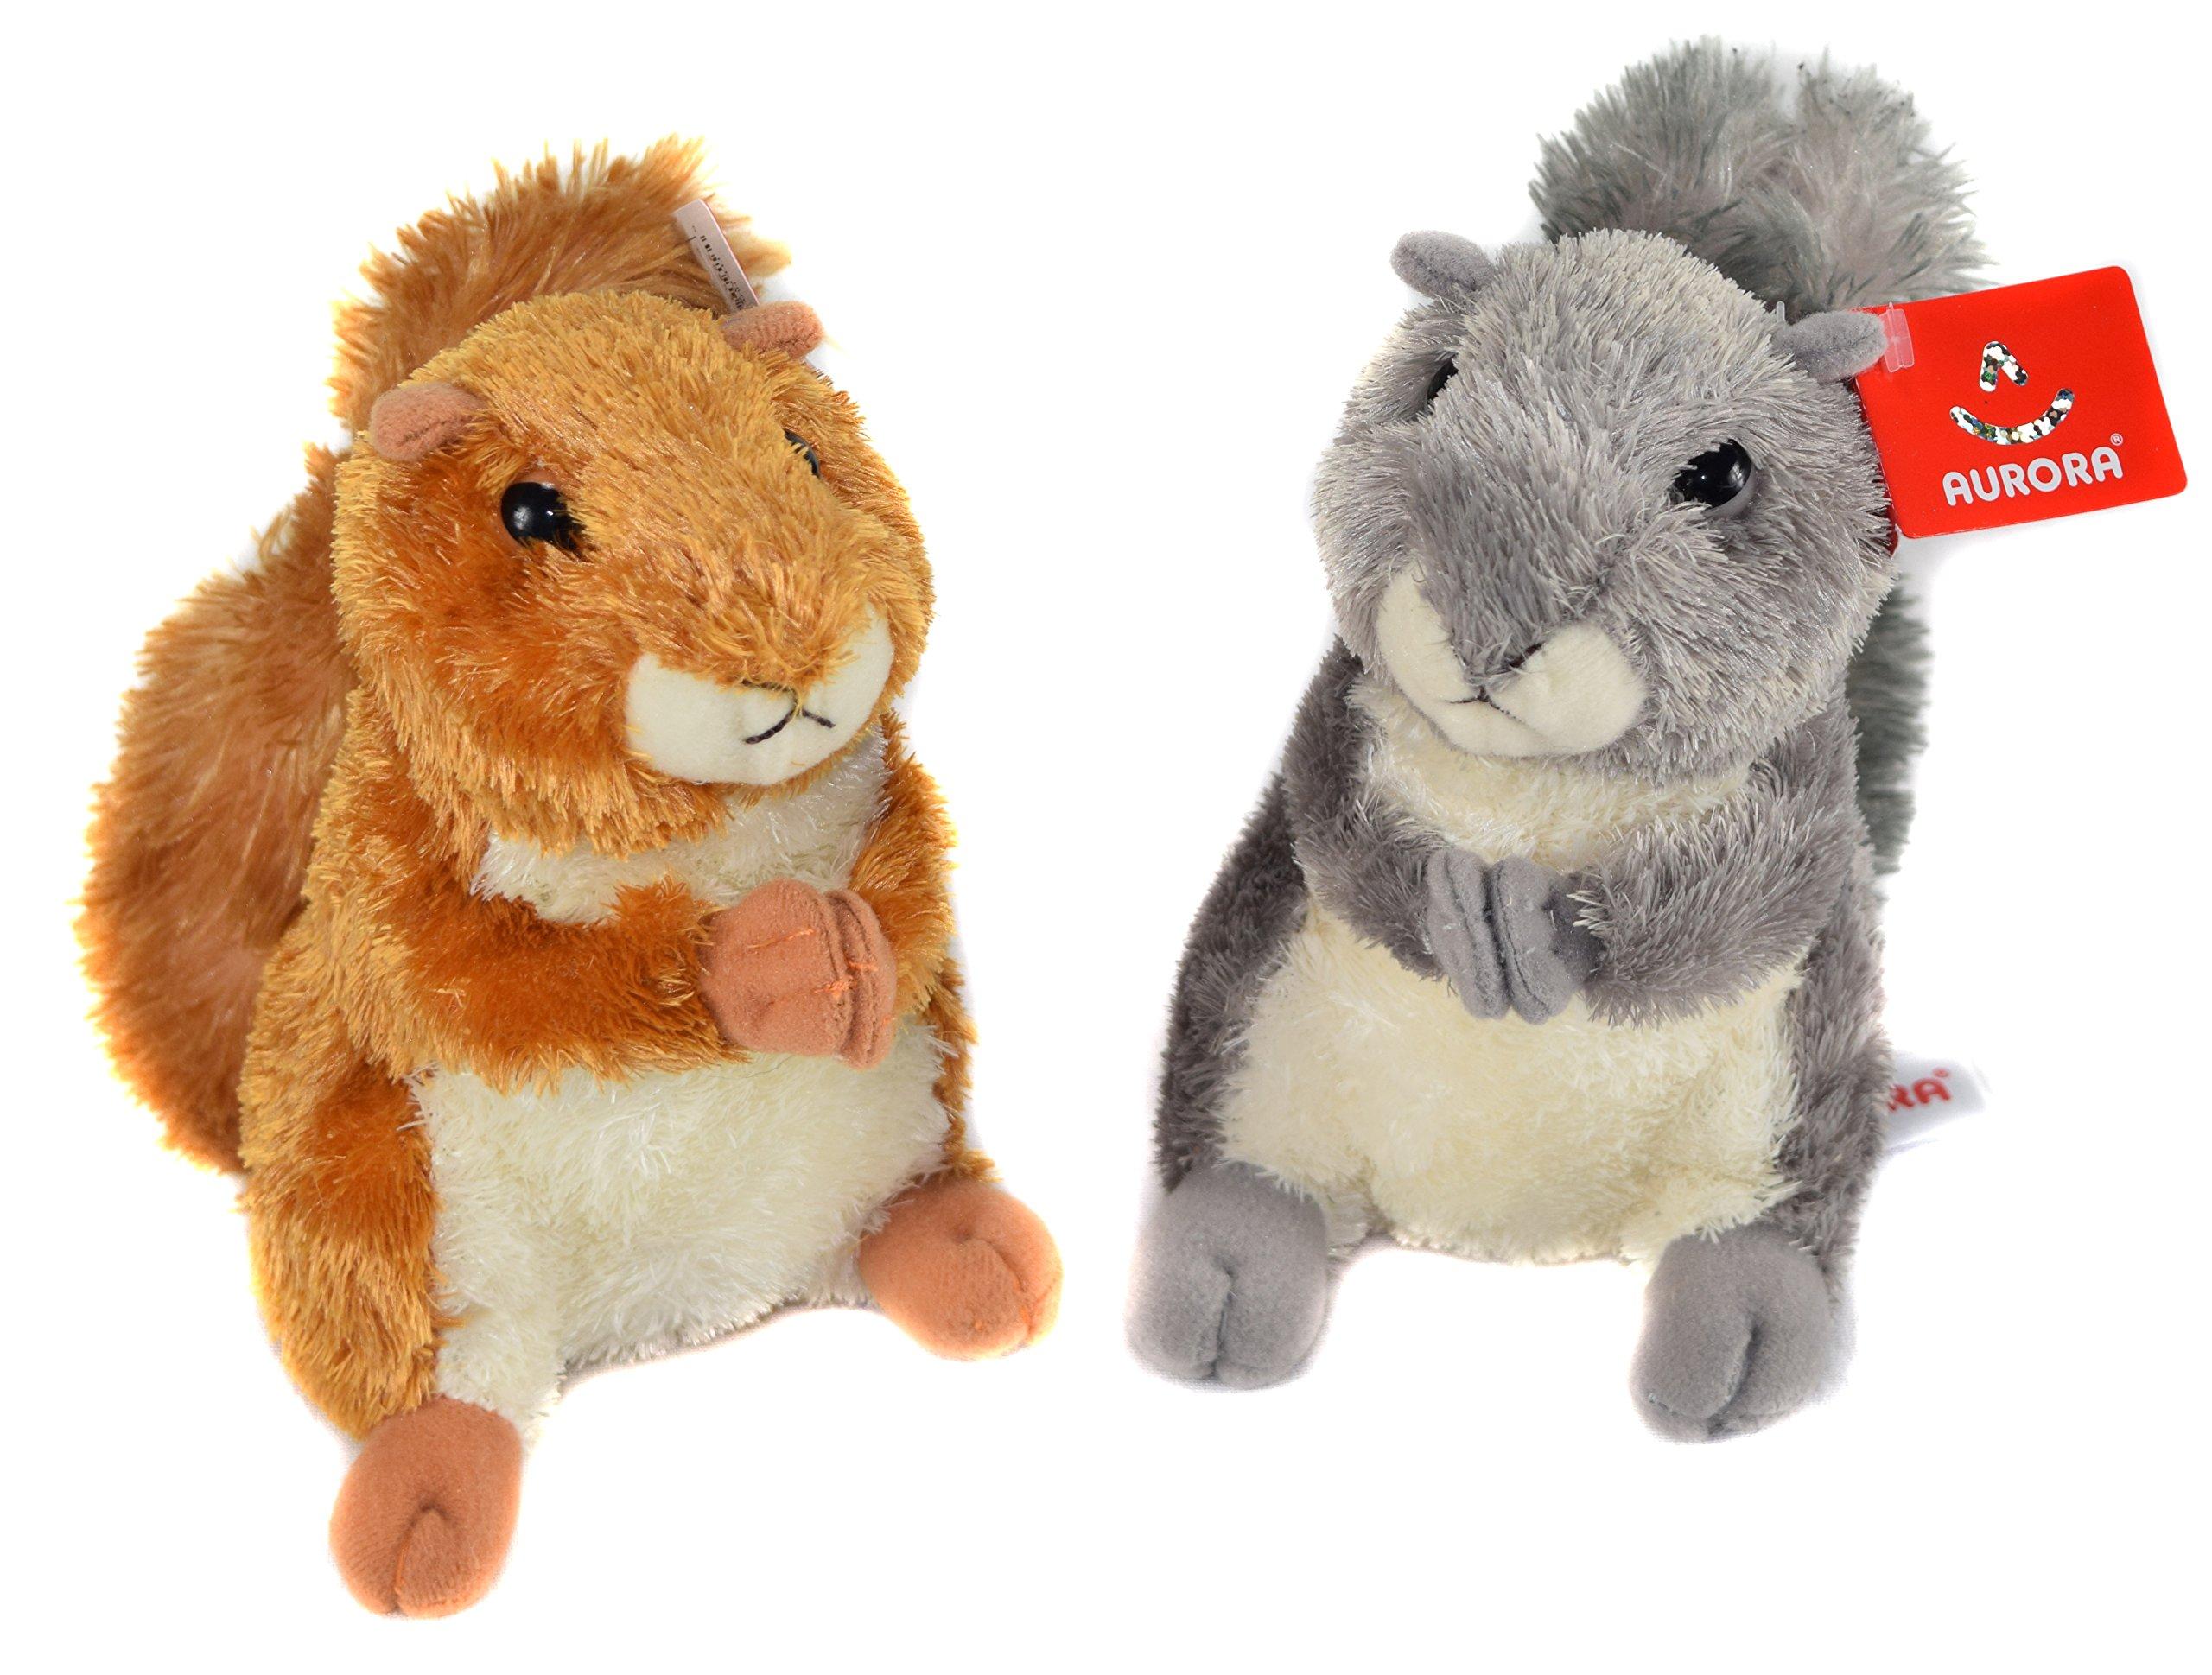 30531 Nutsie Mini Flopsie, 30532 Nutty Mini Flopsie, Bundle of Two Cute Adorable Squirrels Plush Toys, Soft and Fluffy Stuffed Animals Small, By Aurora World